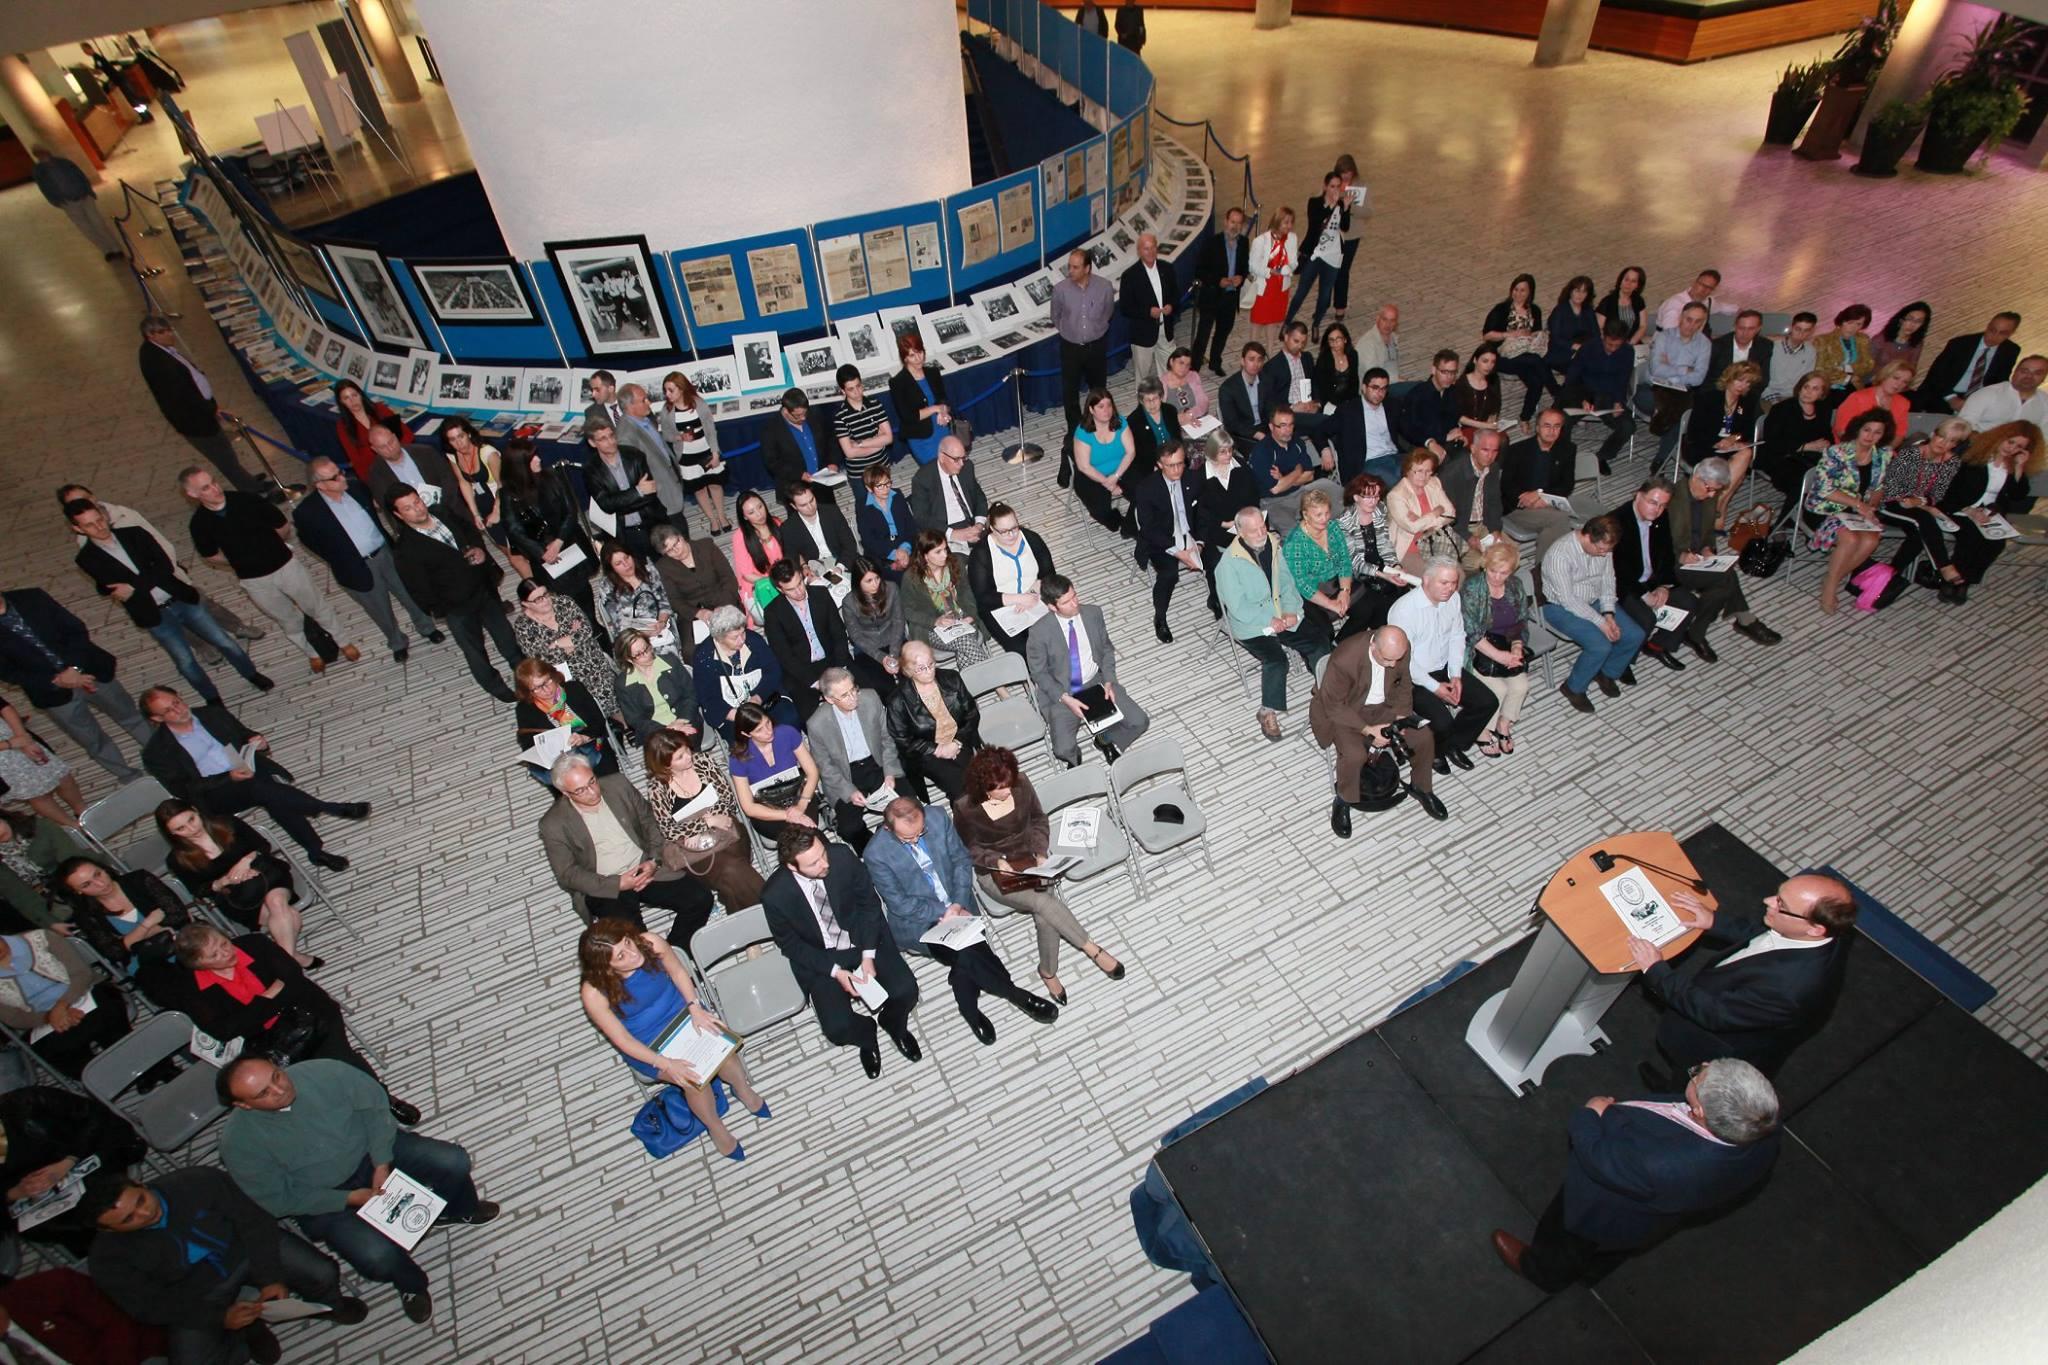 GCHP Exhibit - May 12